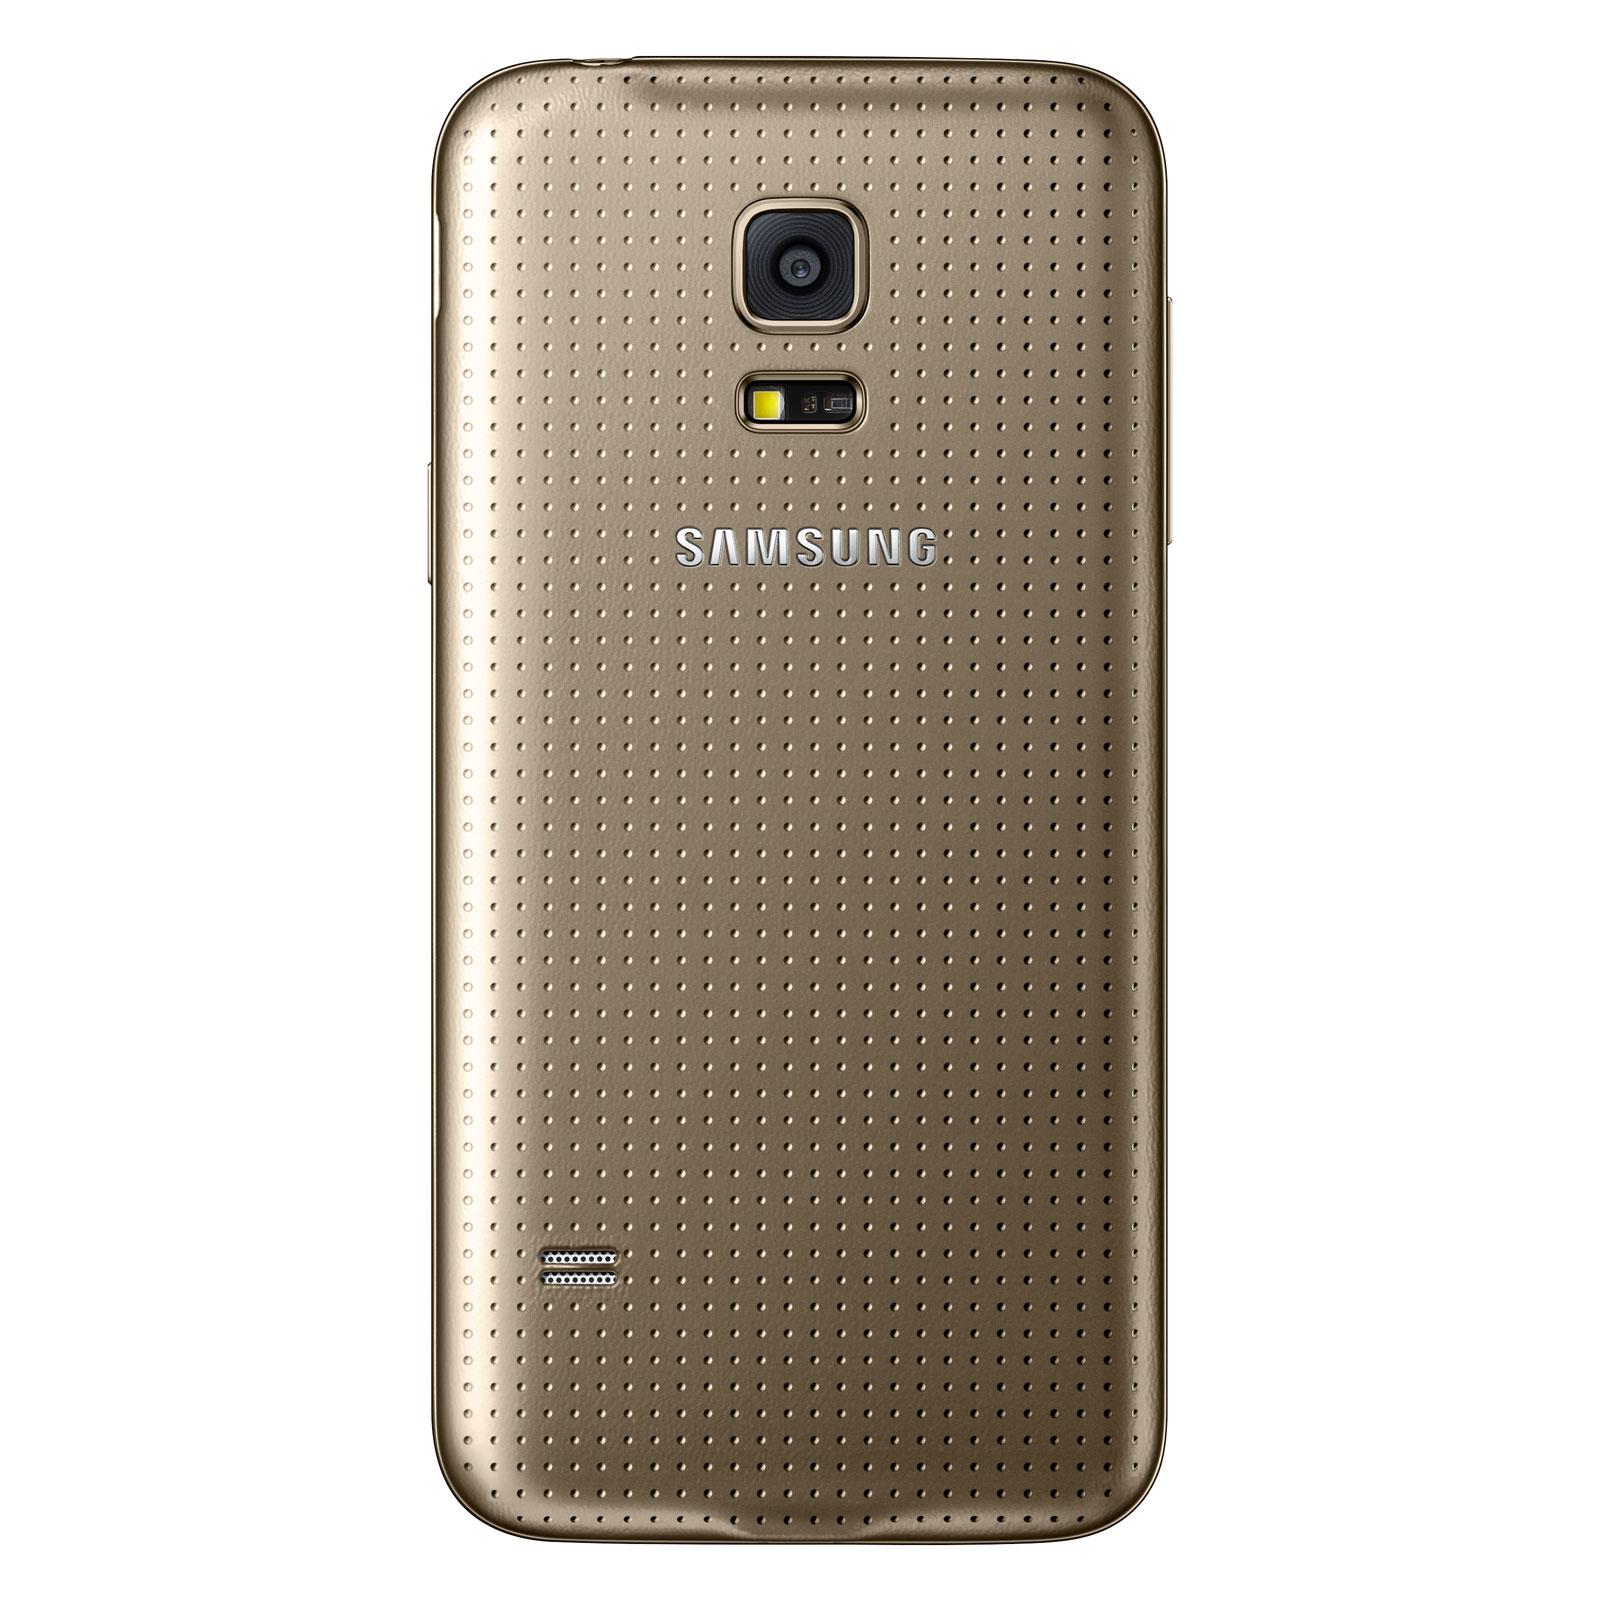 samsung galaxy s5 mini sm g800 or 16 go mobile smartphone samsung sur. Black Bedroom Furniture Sets. Home Design Ideas